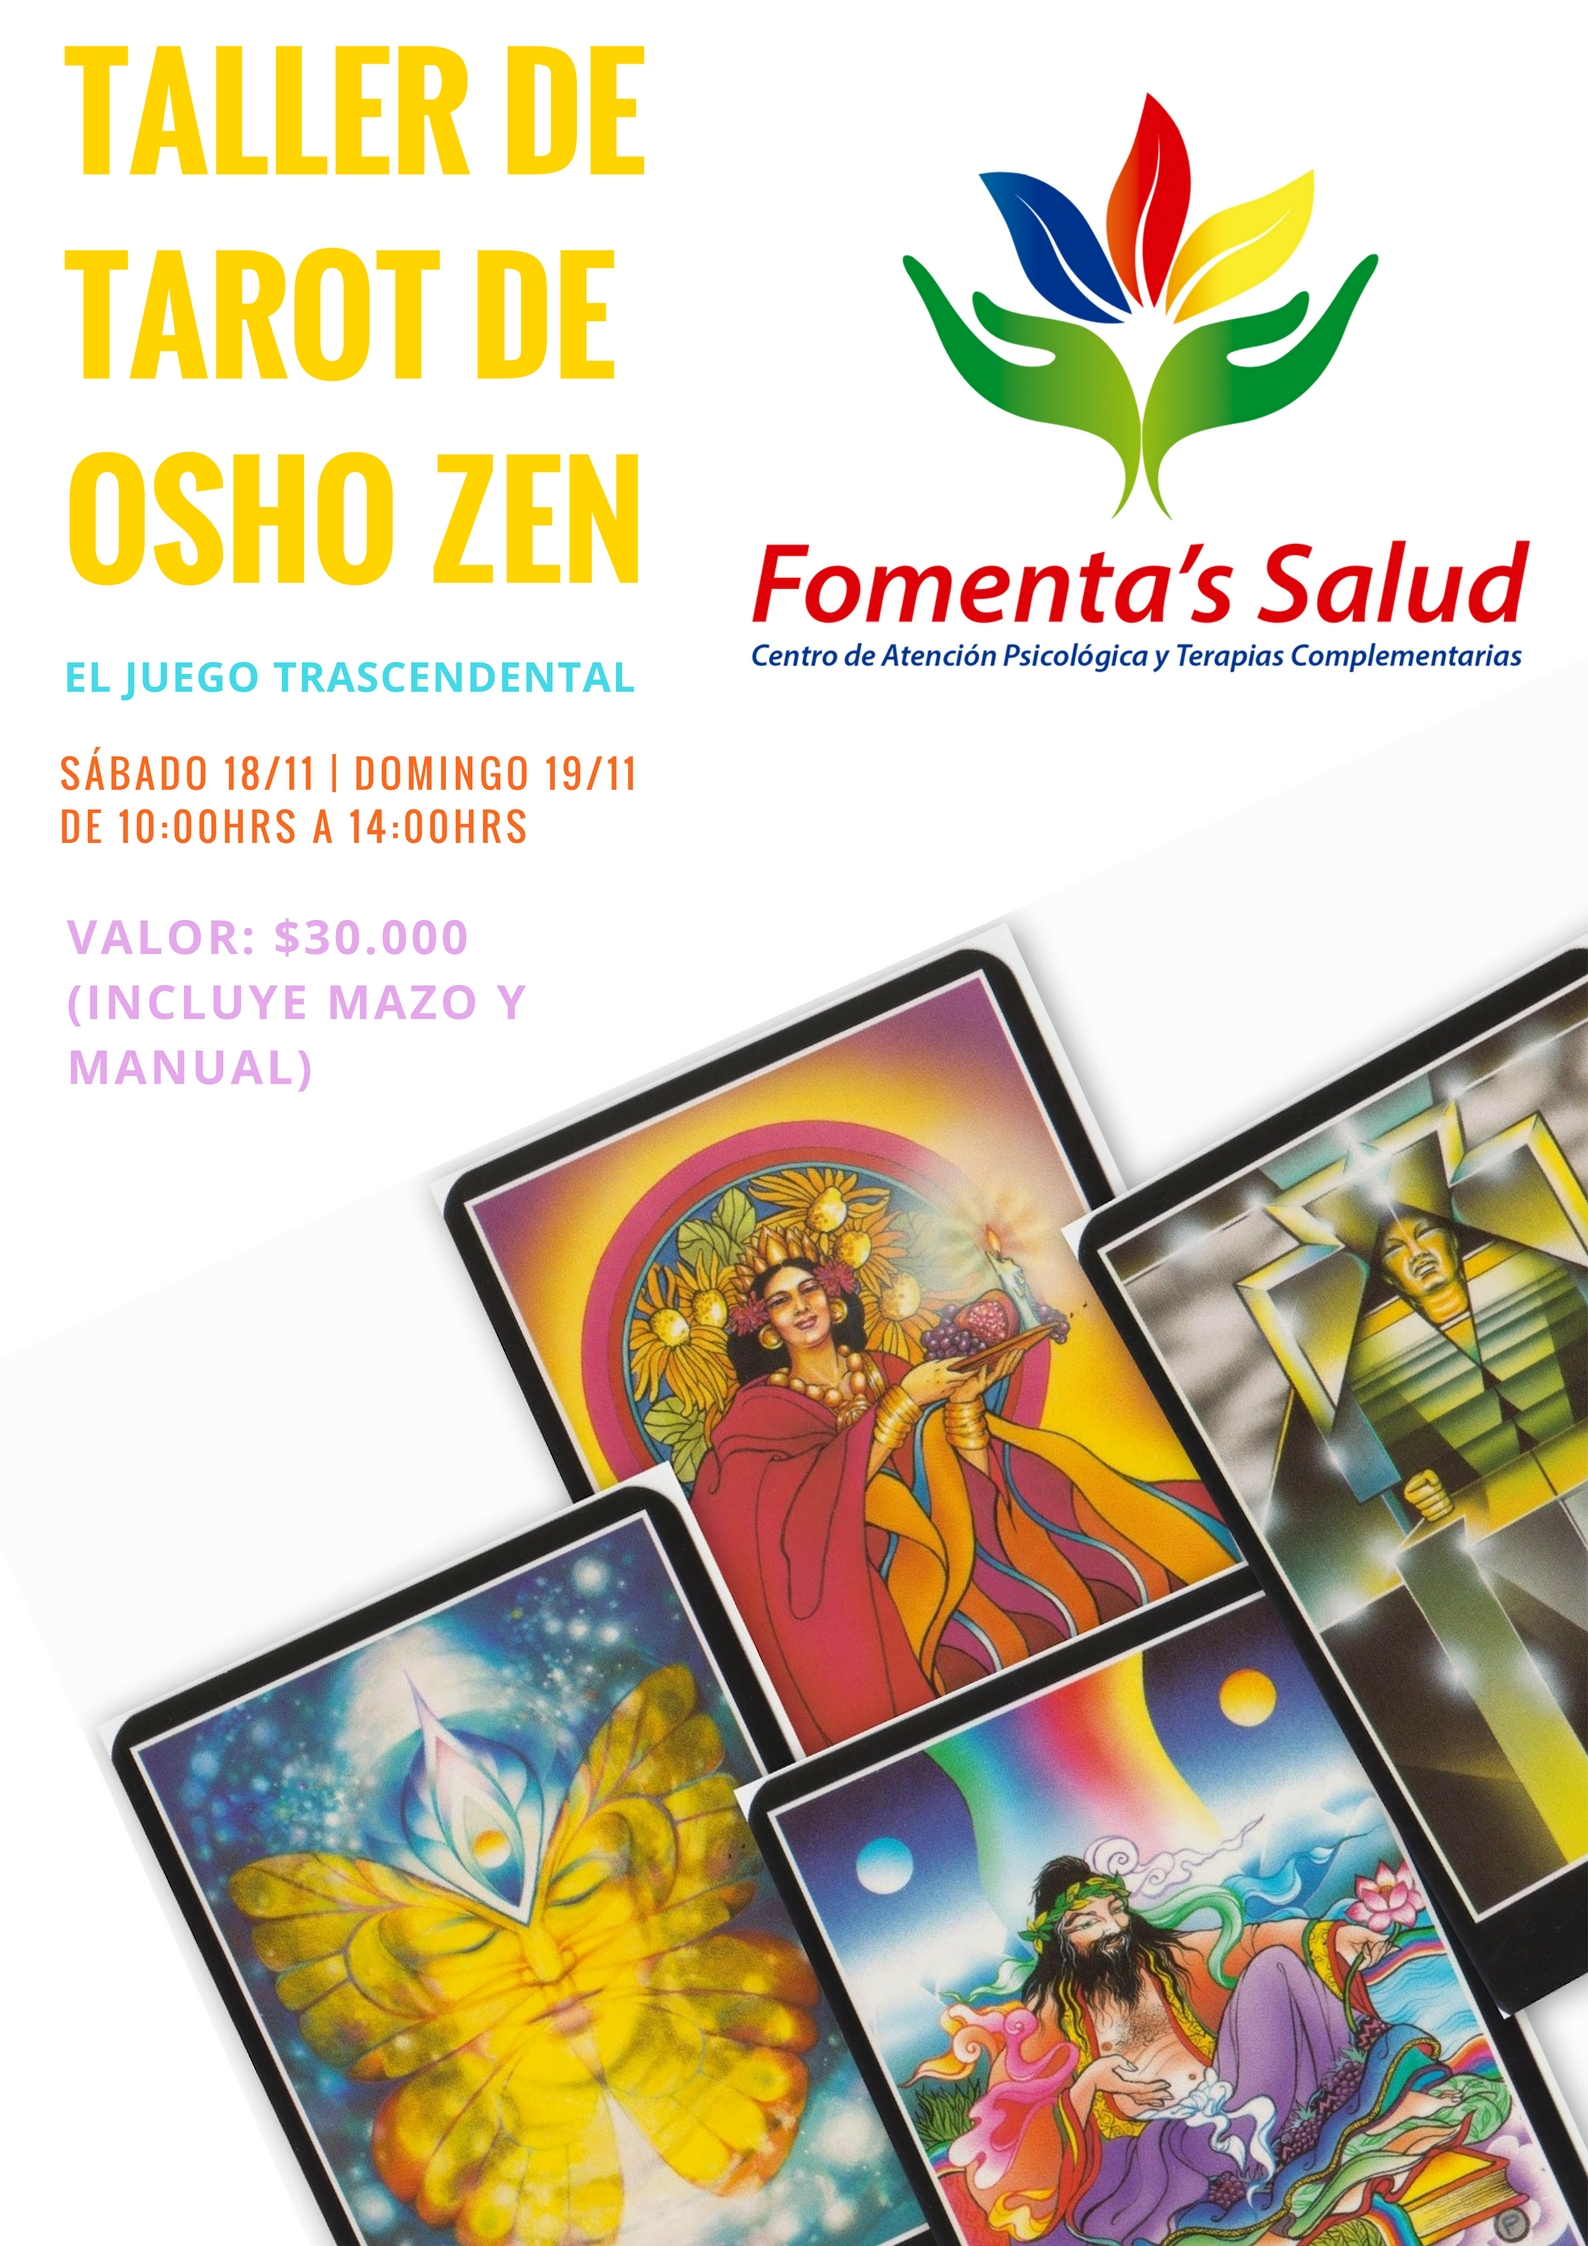 Taller de Tarot Osho Zen, El Juego Trascendental